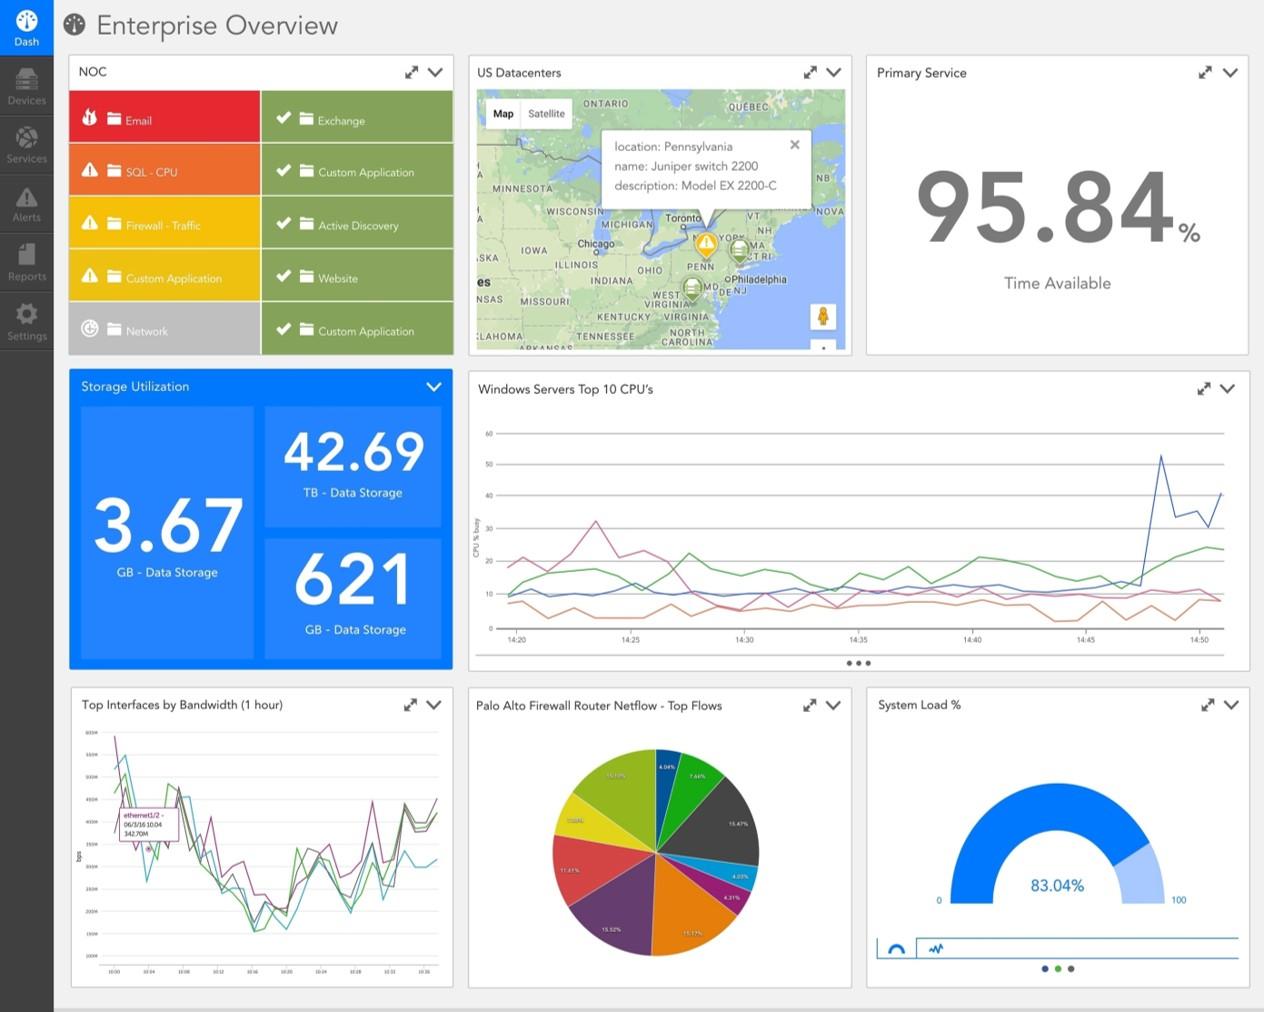 LogicMonitor_Dashboard_Enterprise_Overview_Network.jpg